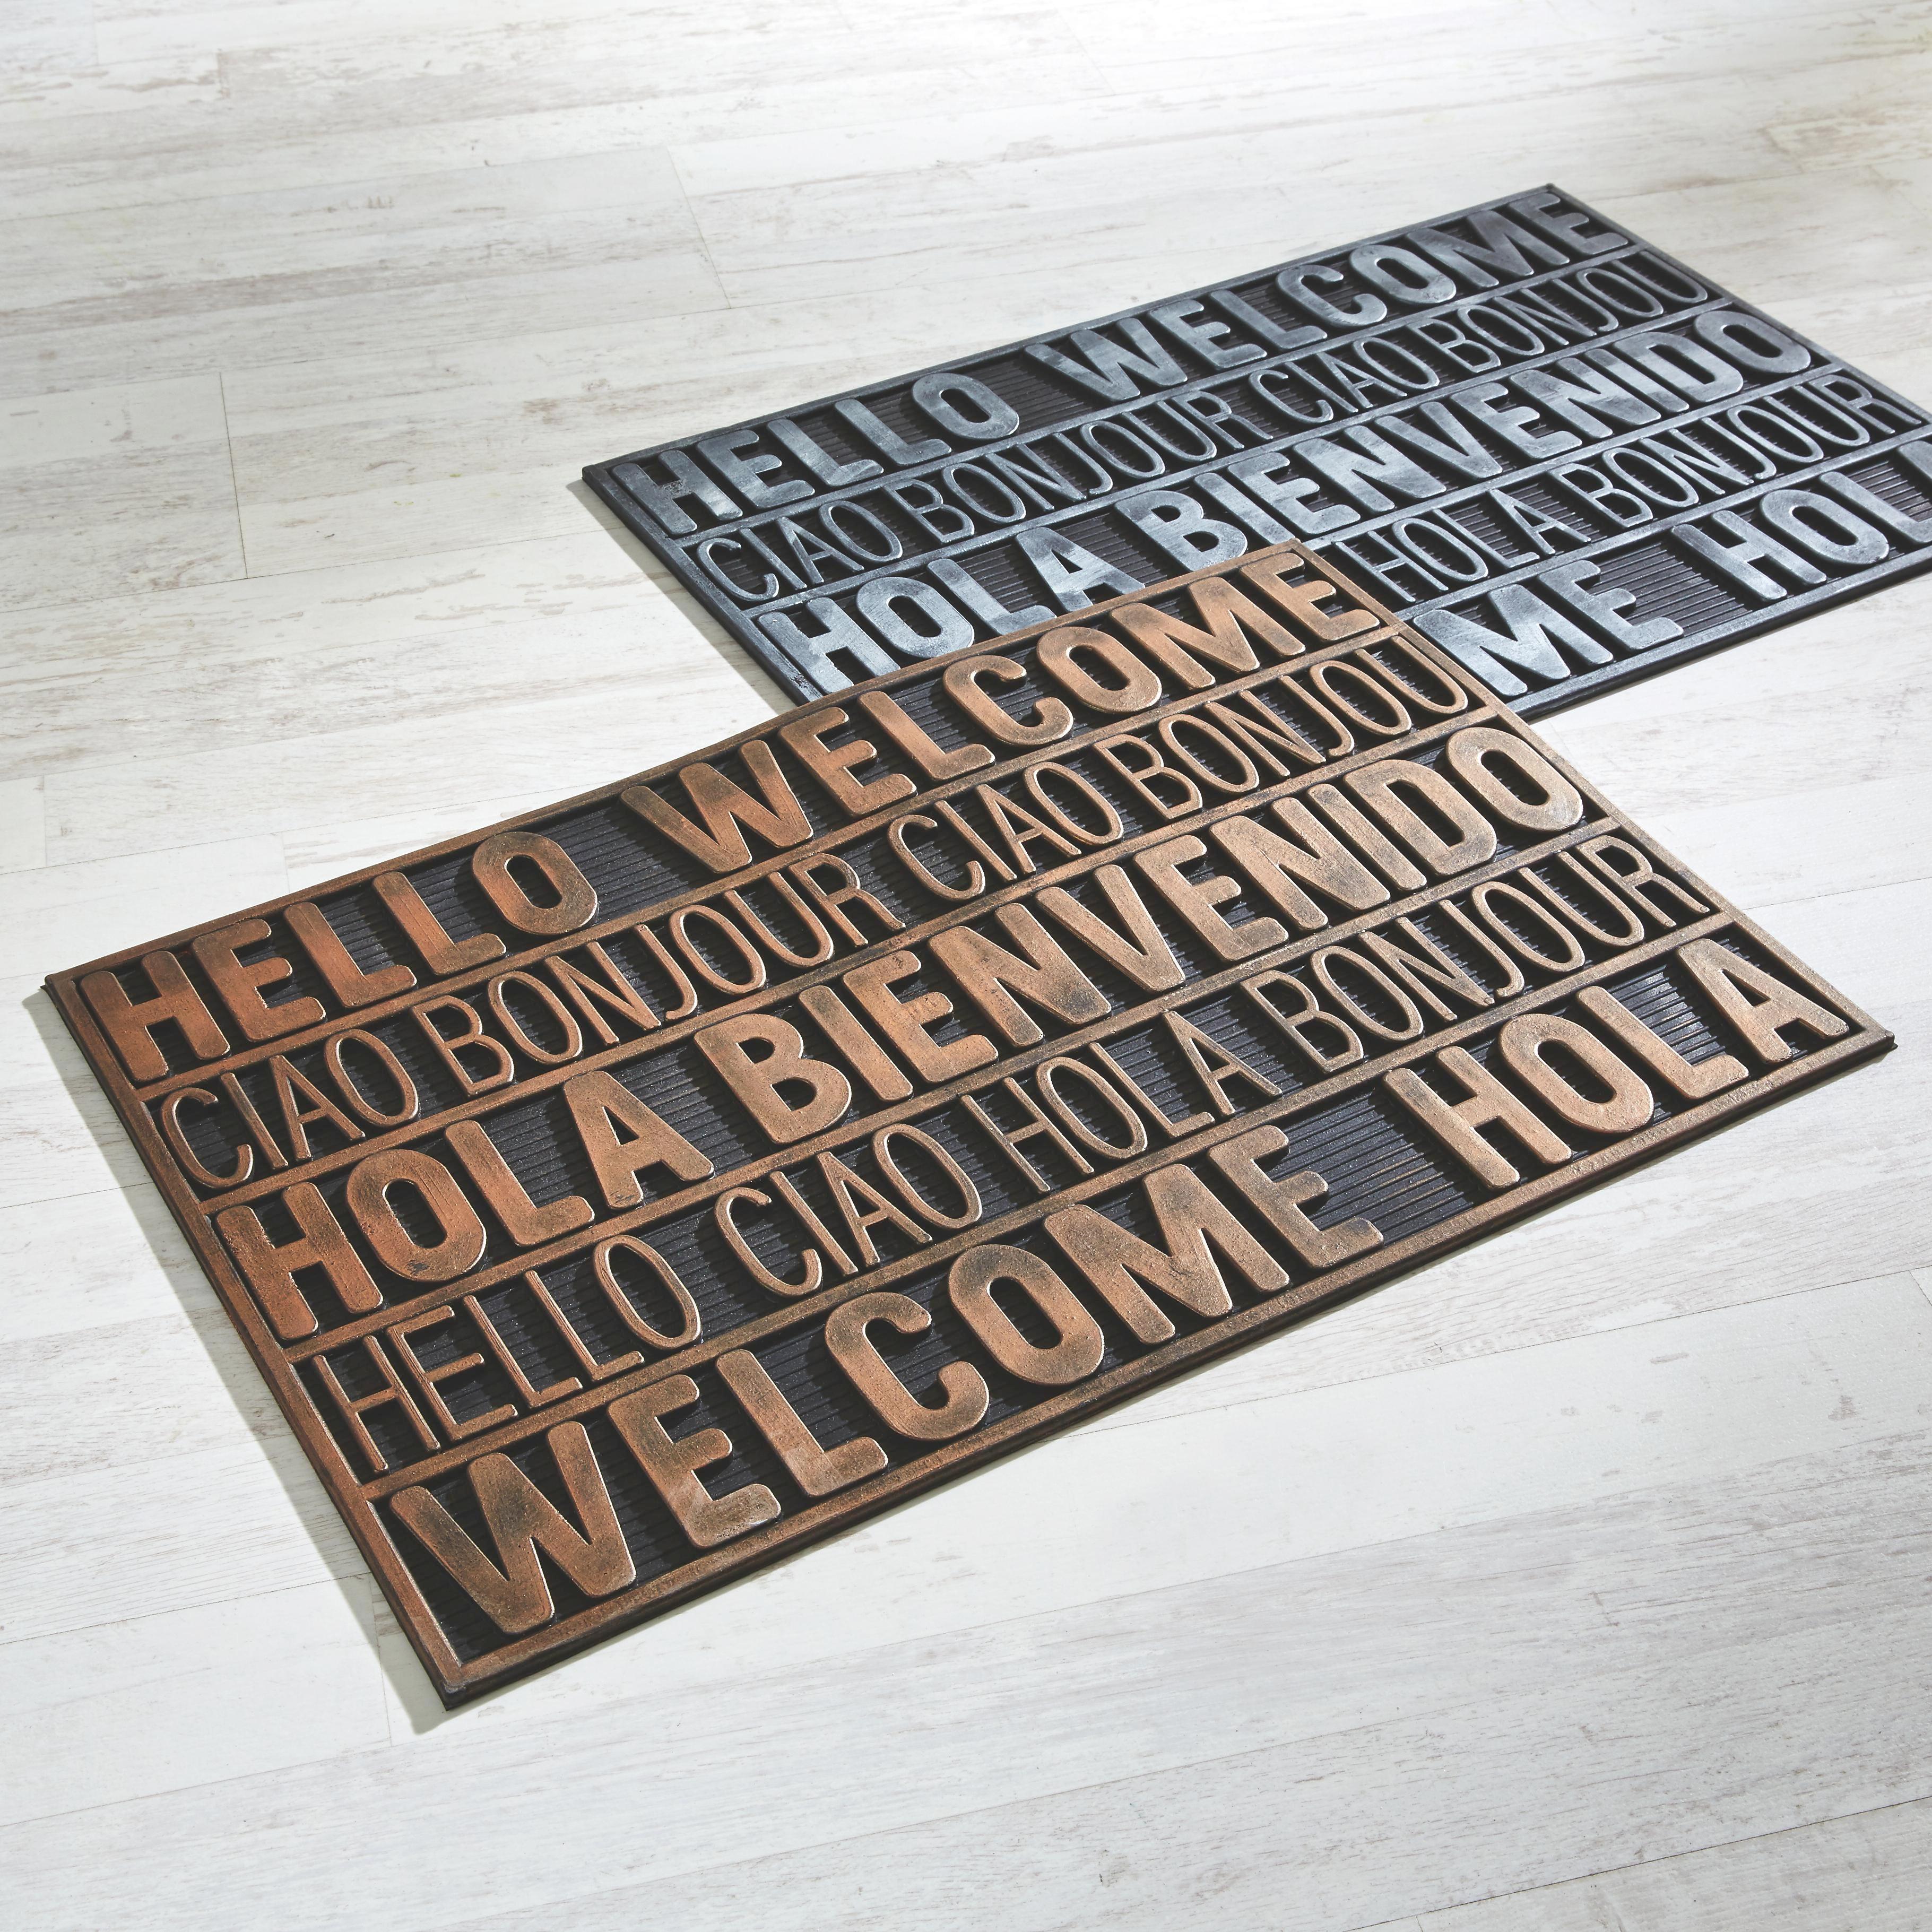 Lábtörlő International Welcome - ezüst színű, modern, műanyag (40/60cm) - MÖMAX modern living